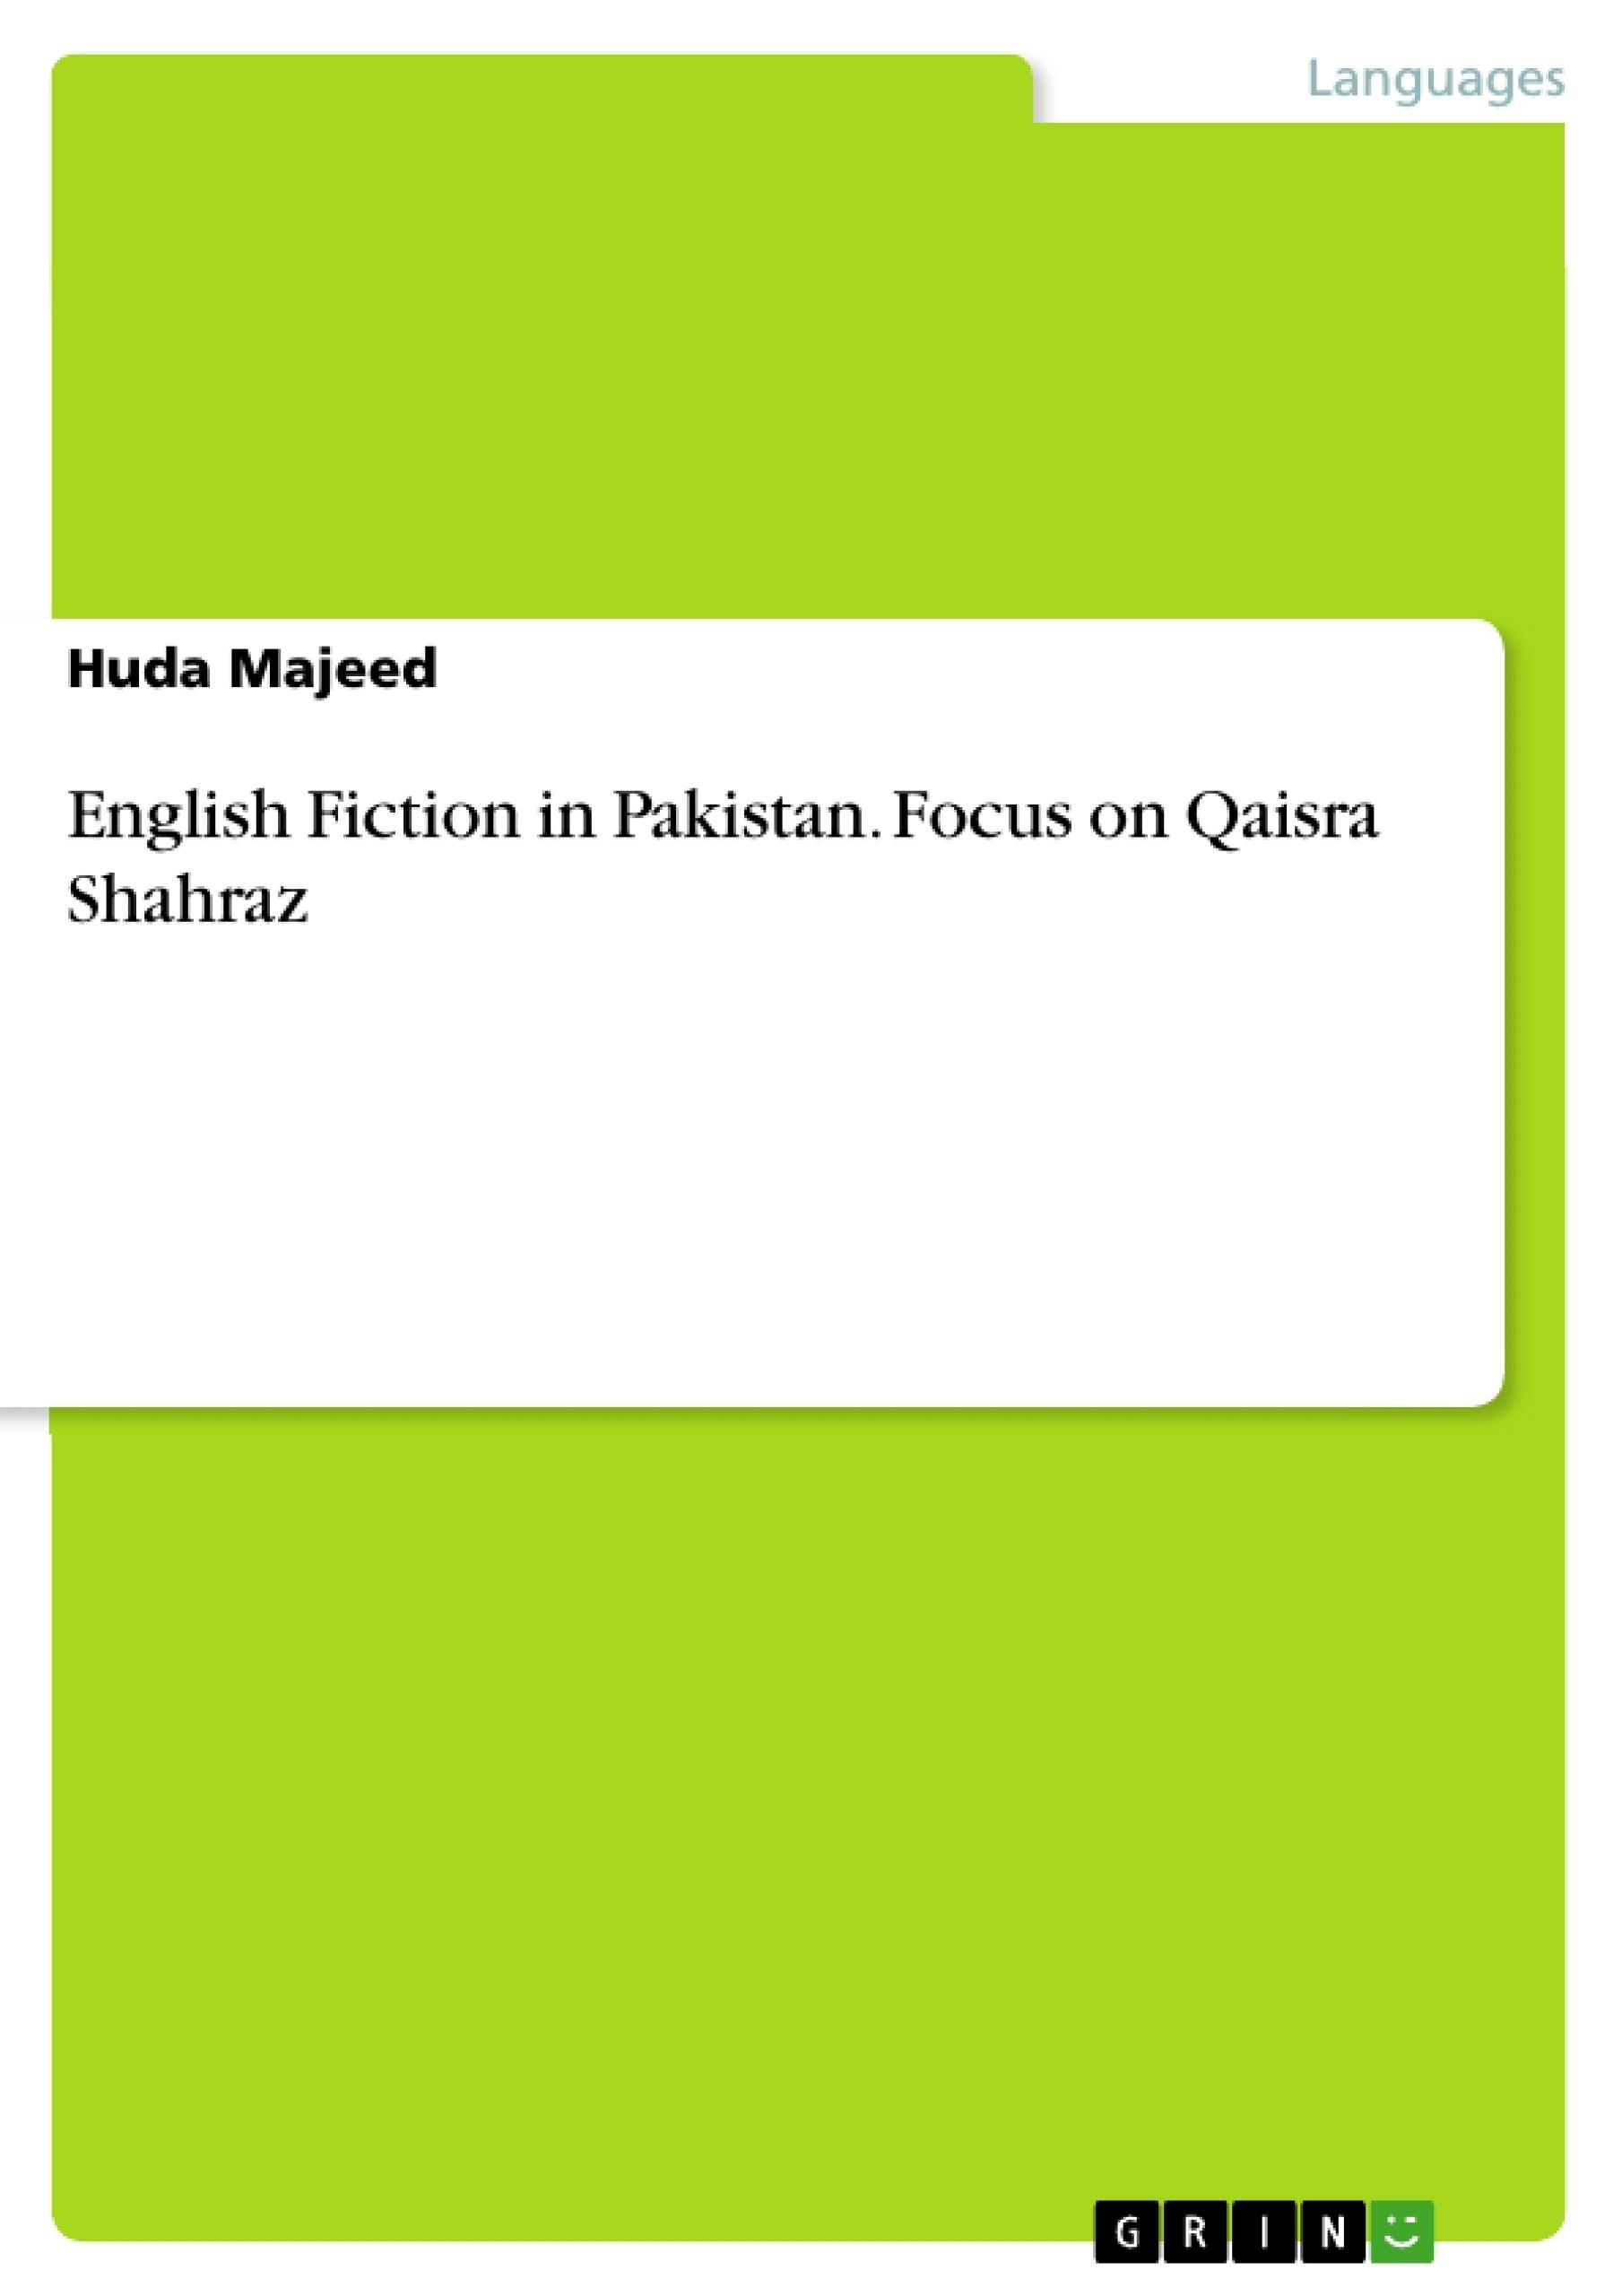 Title: English Fiction in Pakistan. Focus on Qaisra Shahraz